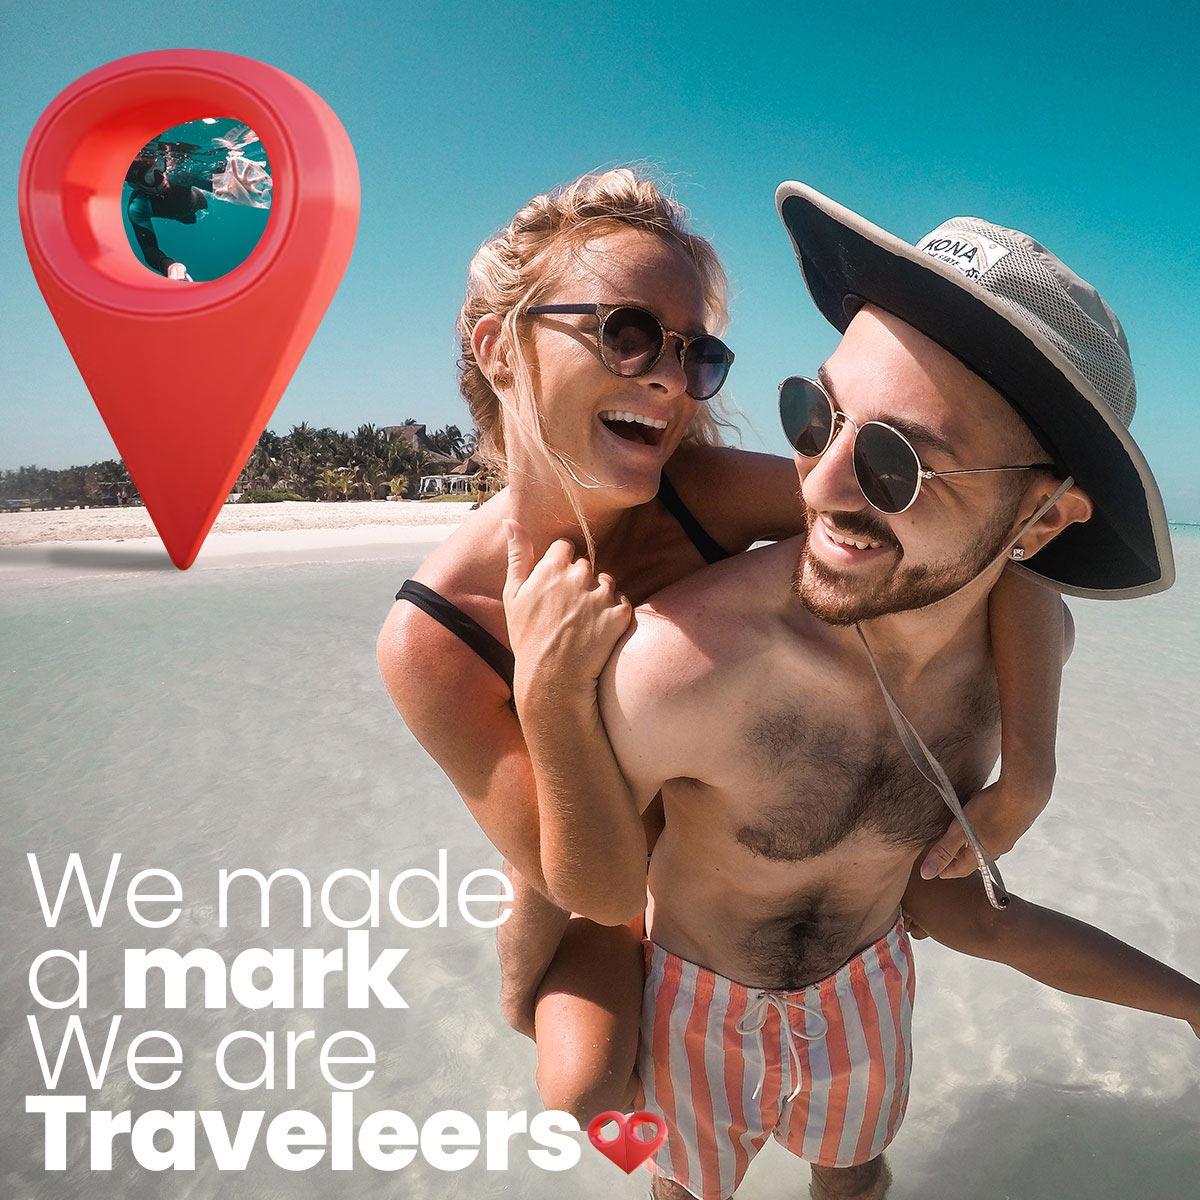 Traveleers